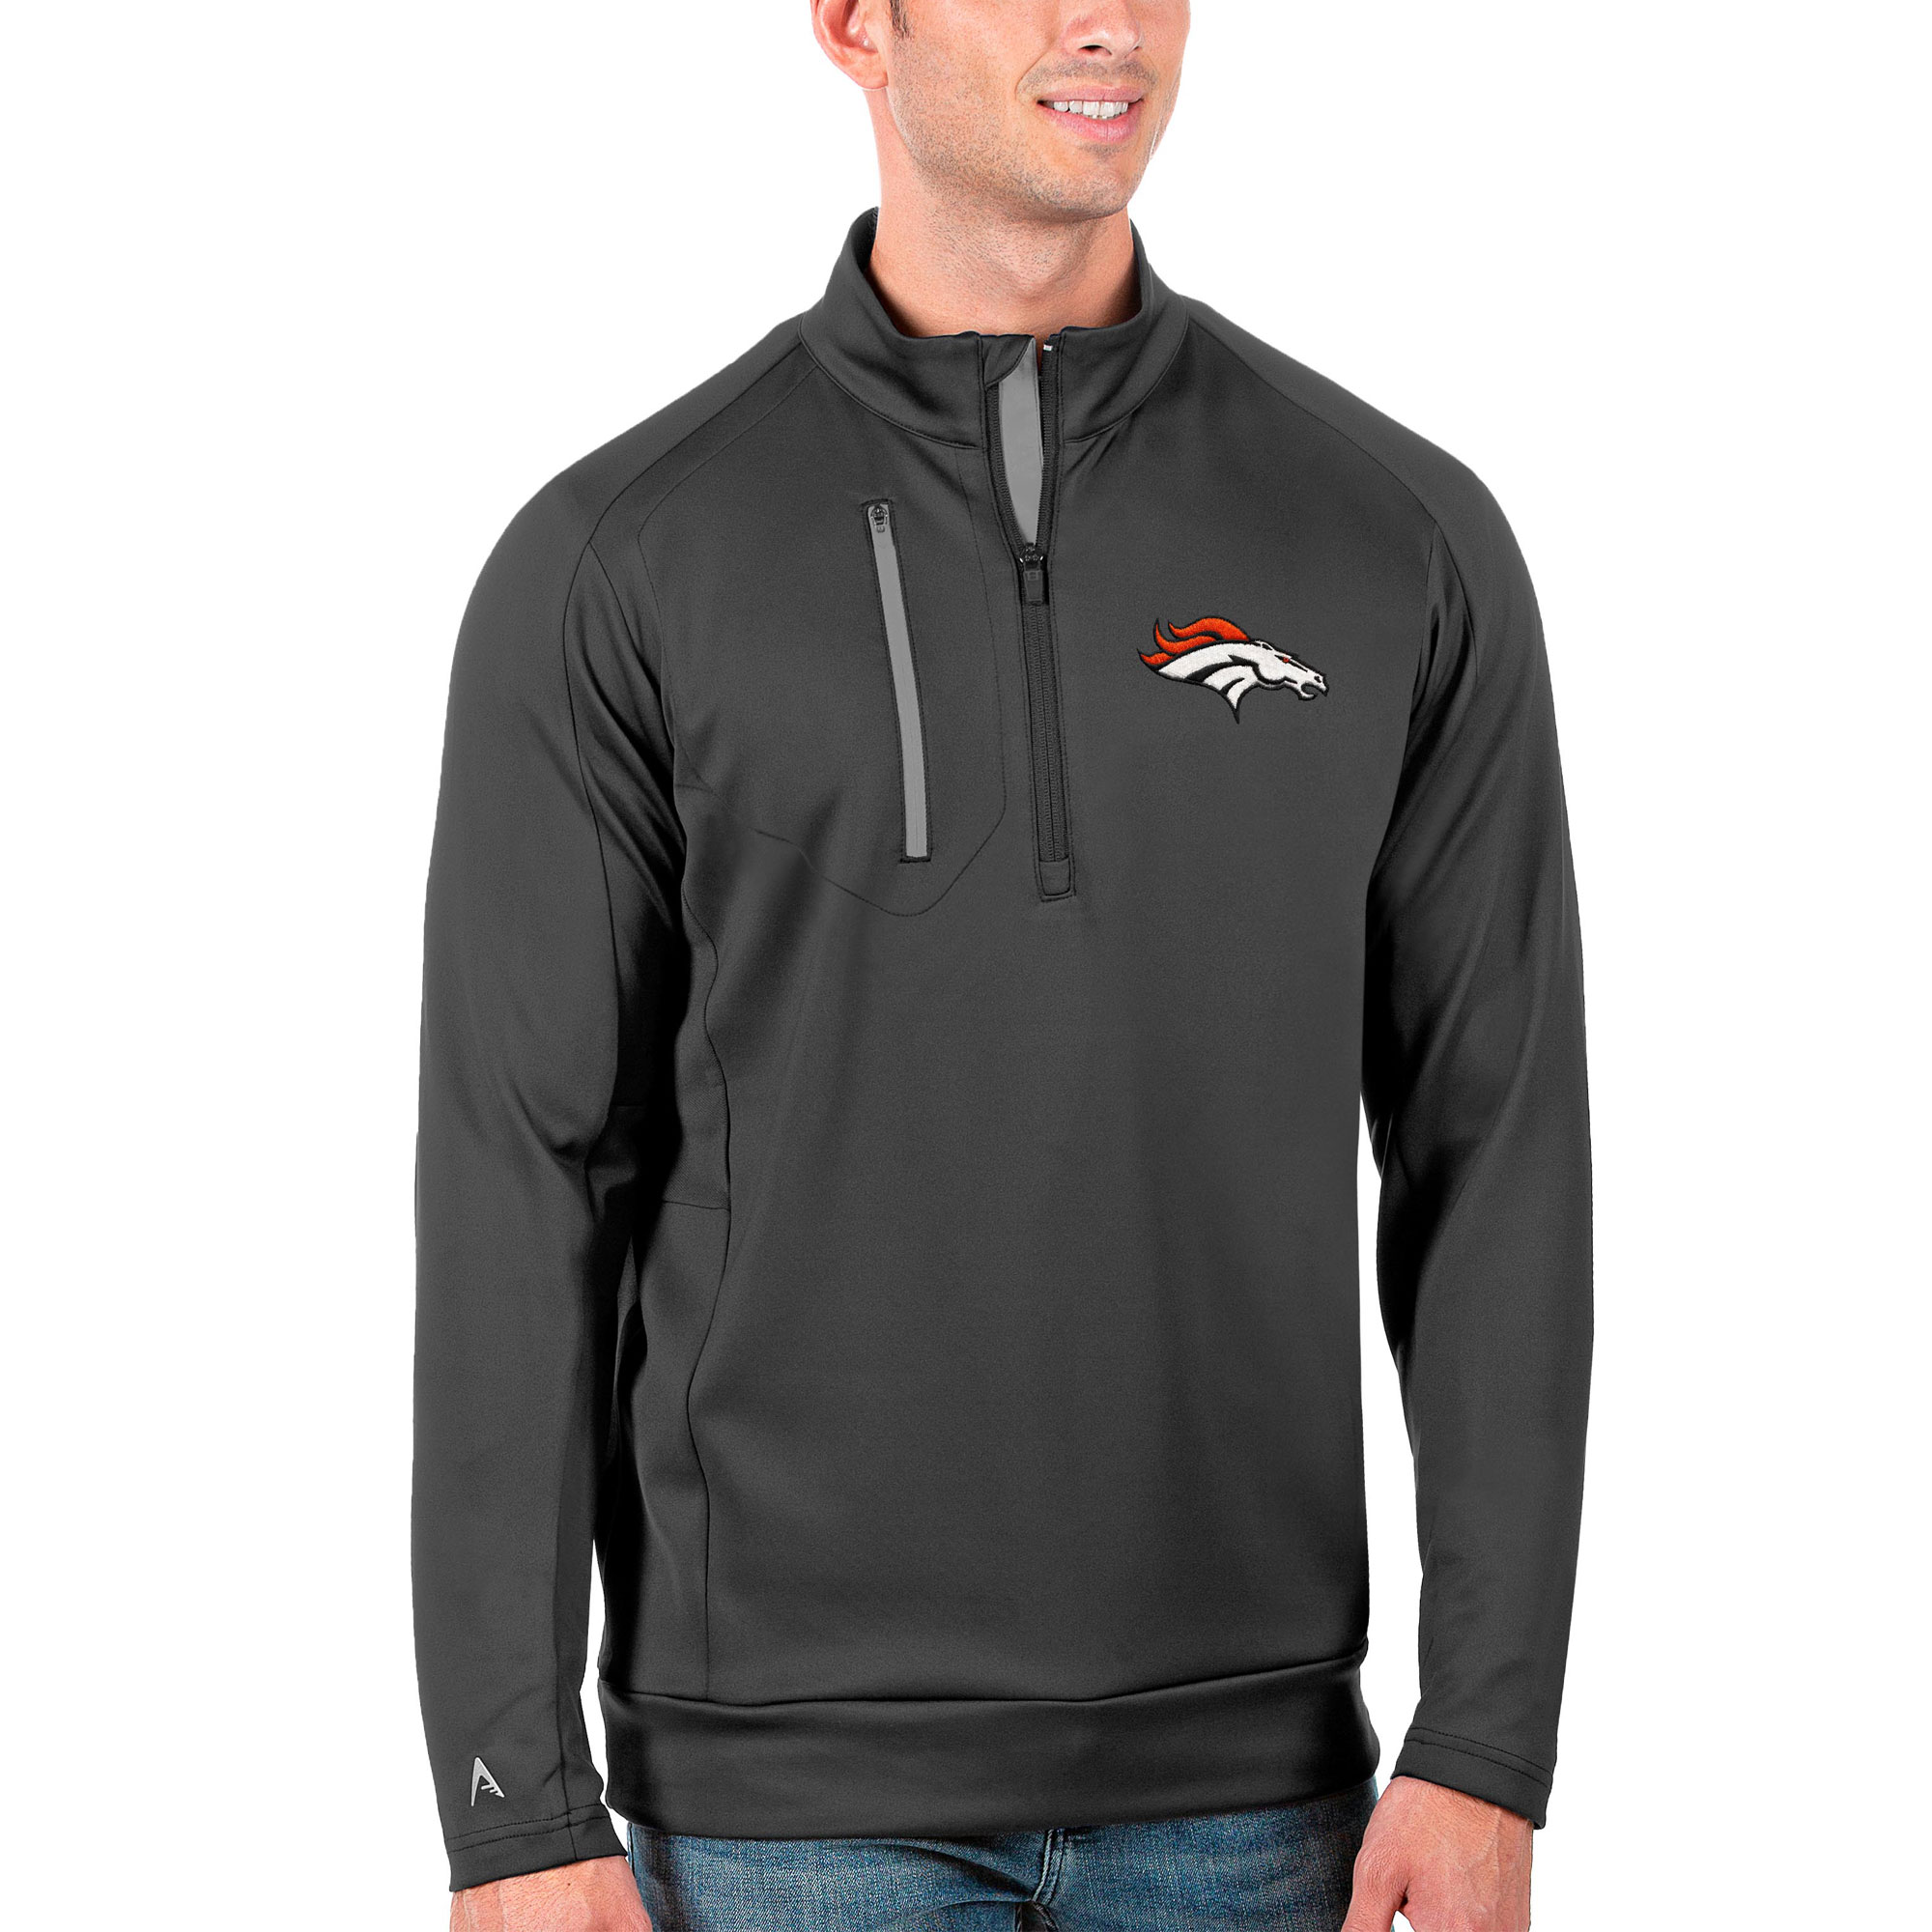 Denver Broncos Antigua Generation Quarter-Zip Pullover Jacket - Charcoal/Silver